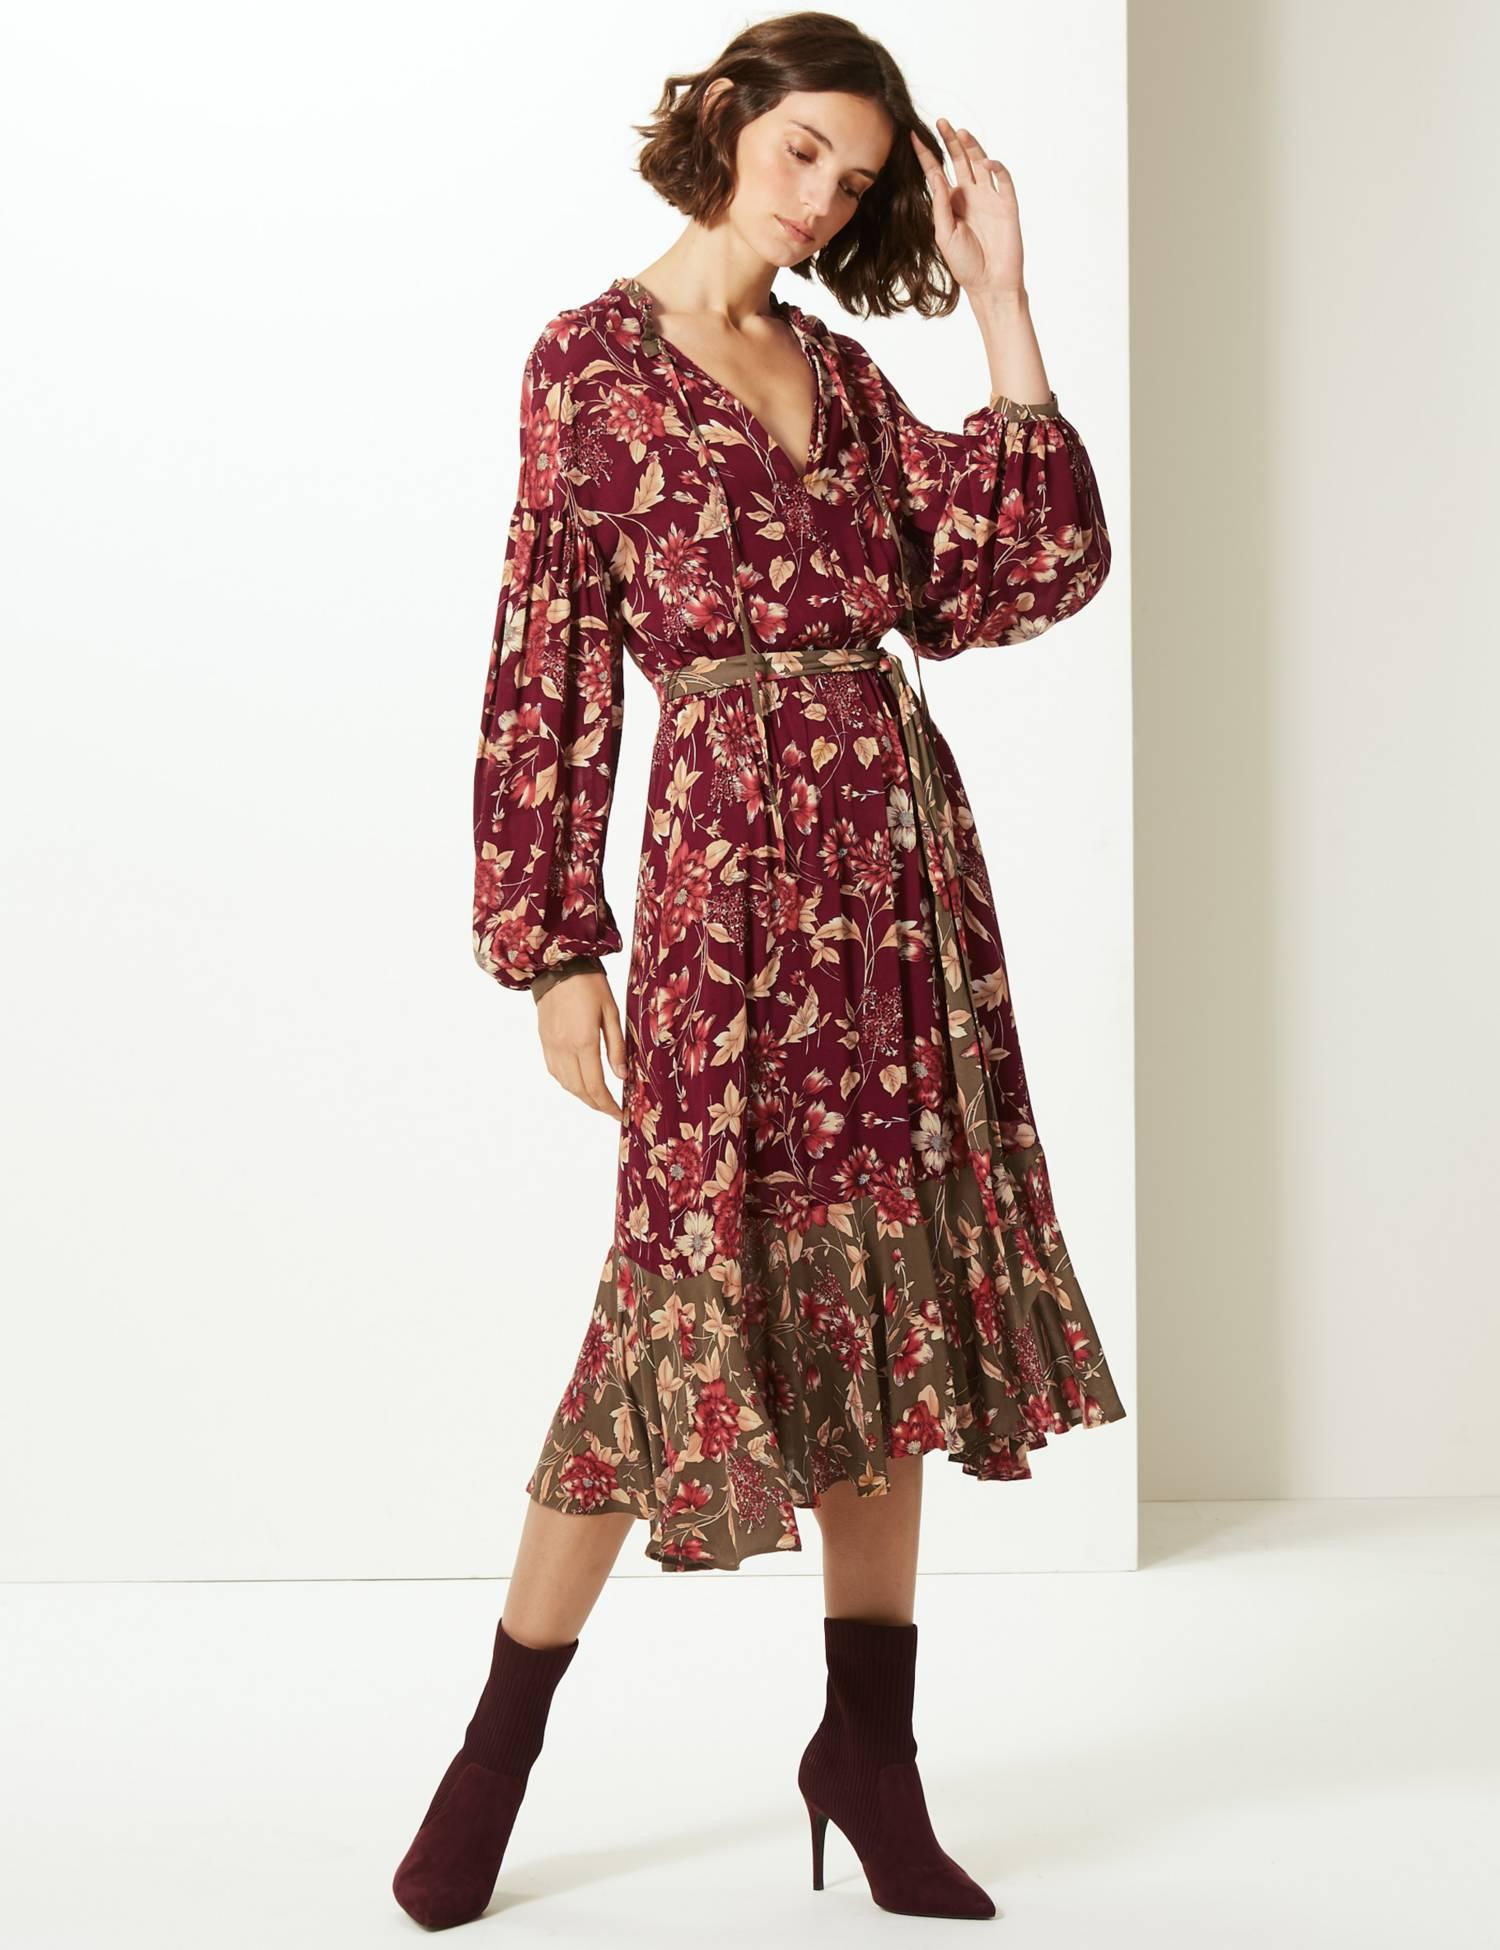 LIMITED EDITION Floral Print Long Sleeve Tea Midi Dress